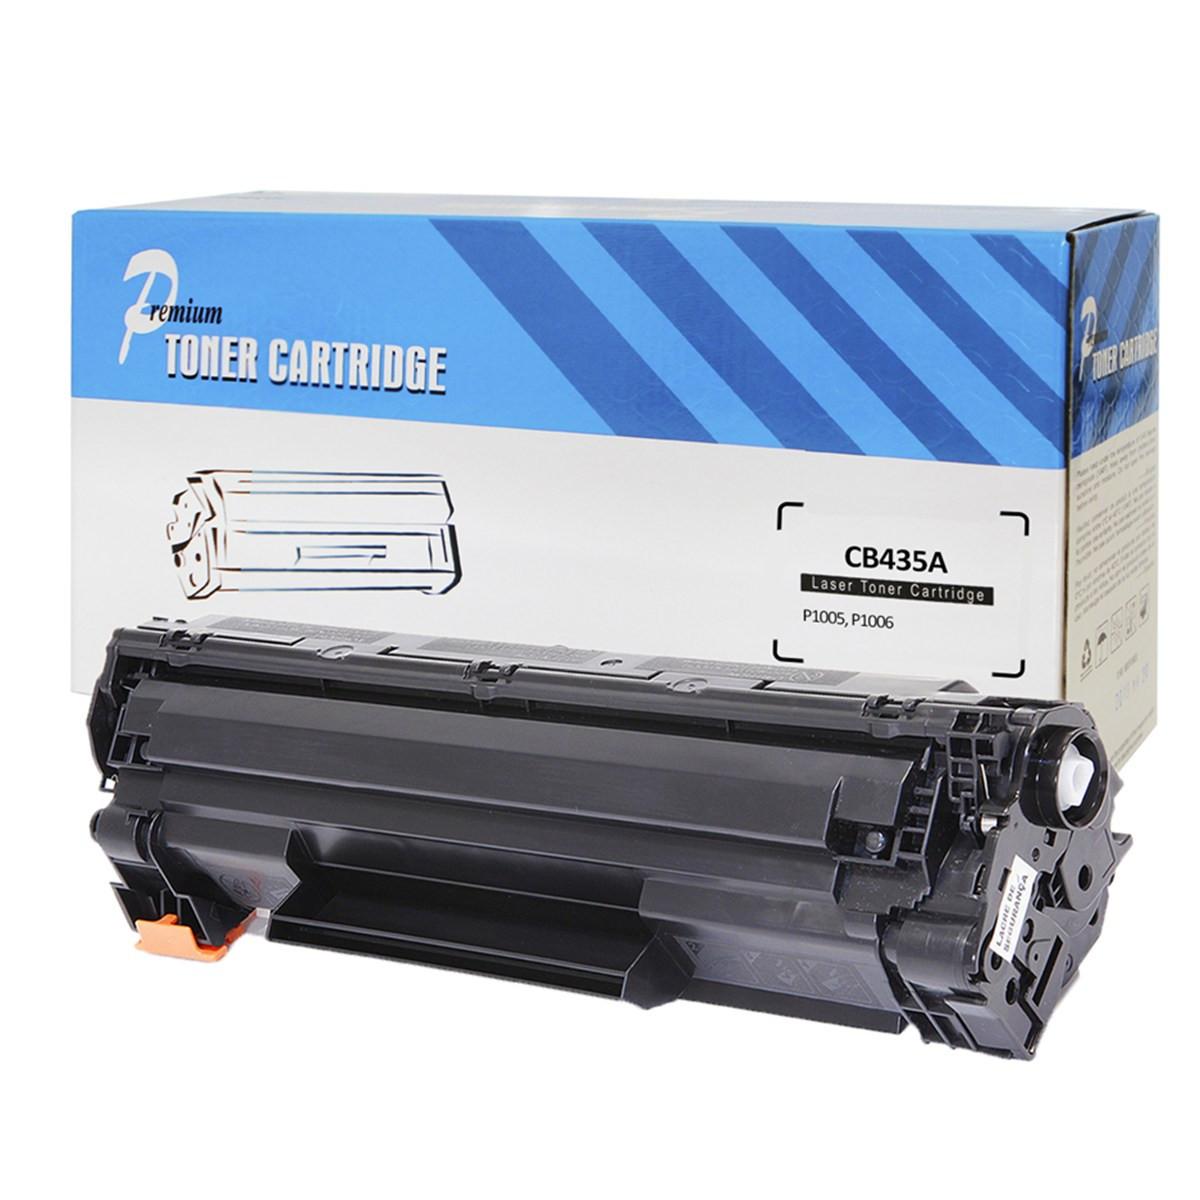 Toner Compatível com HP CB435A 35A 435A CB435AB | LaserJet P1005 P1006 | Premium 1.8k